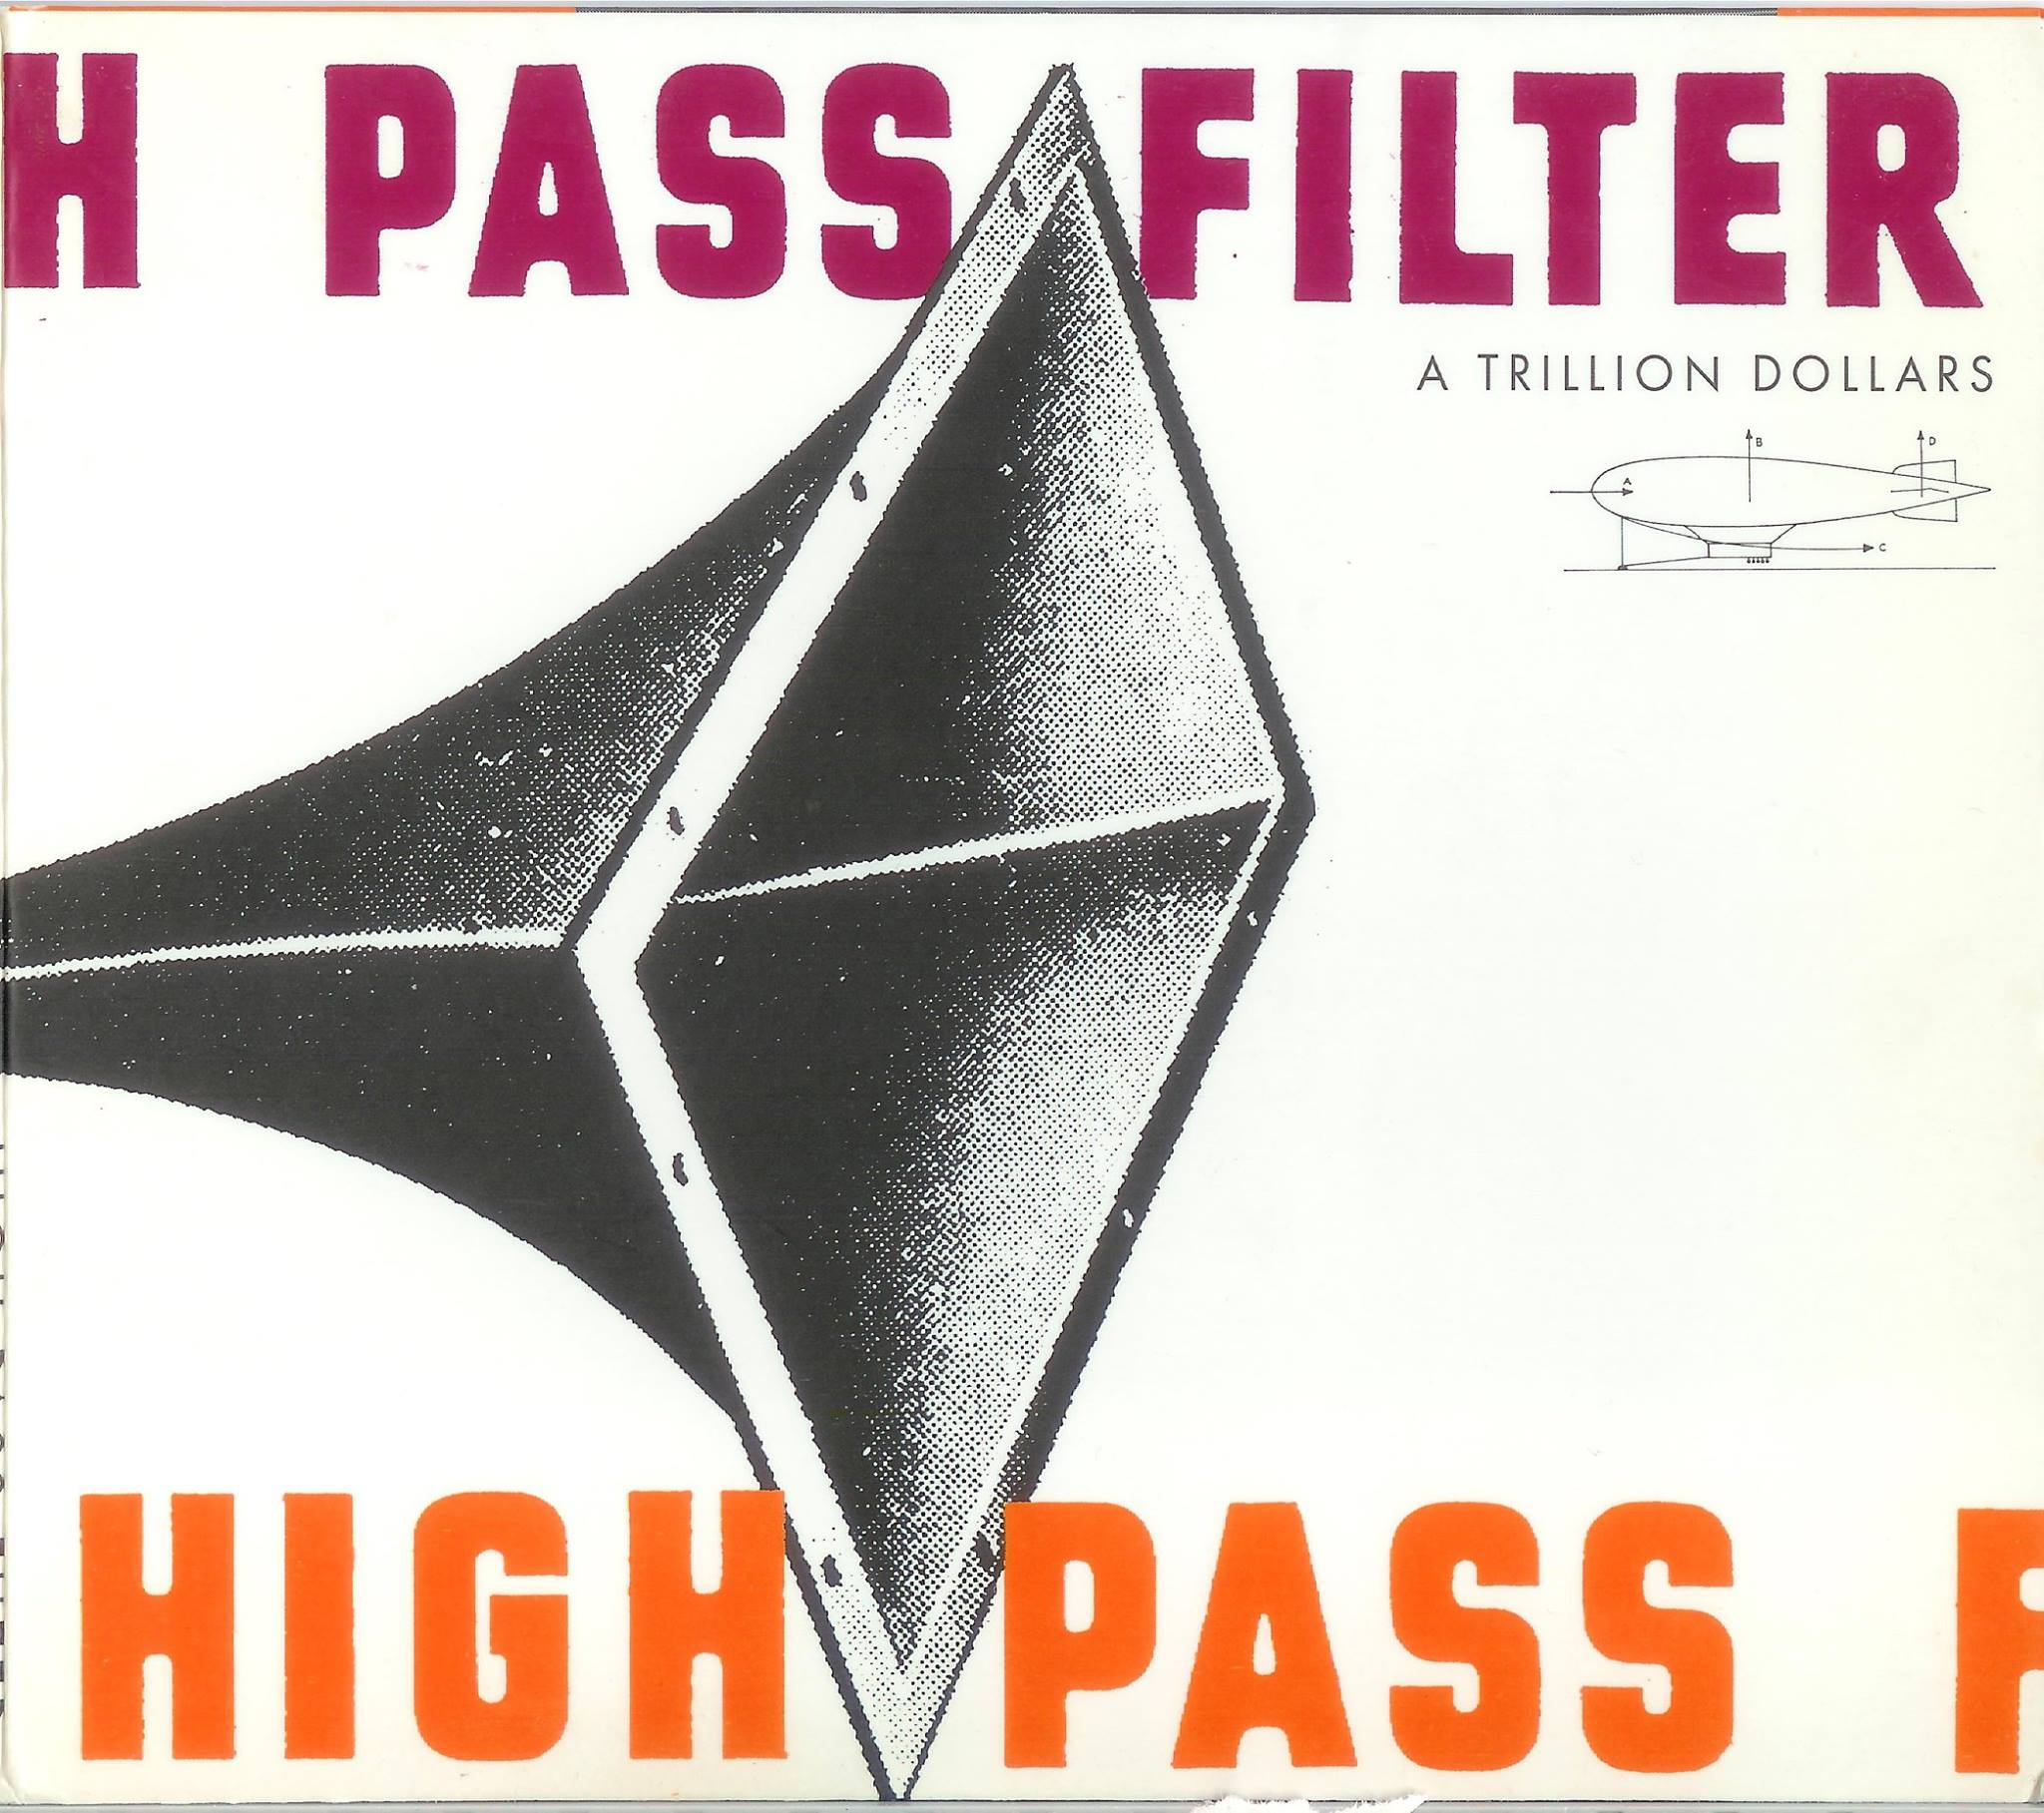 hpf trillion.jpg